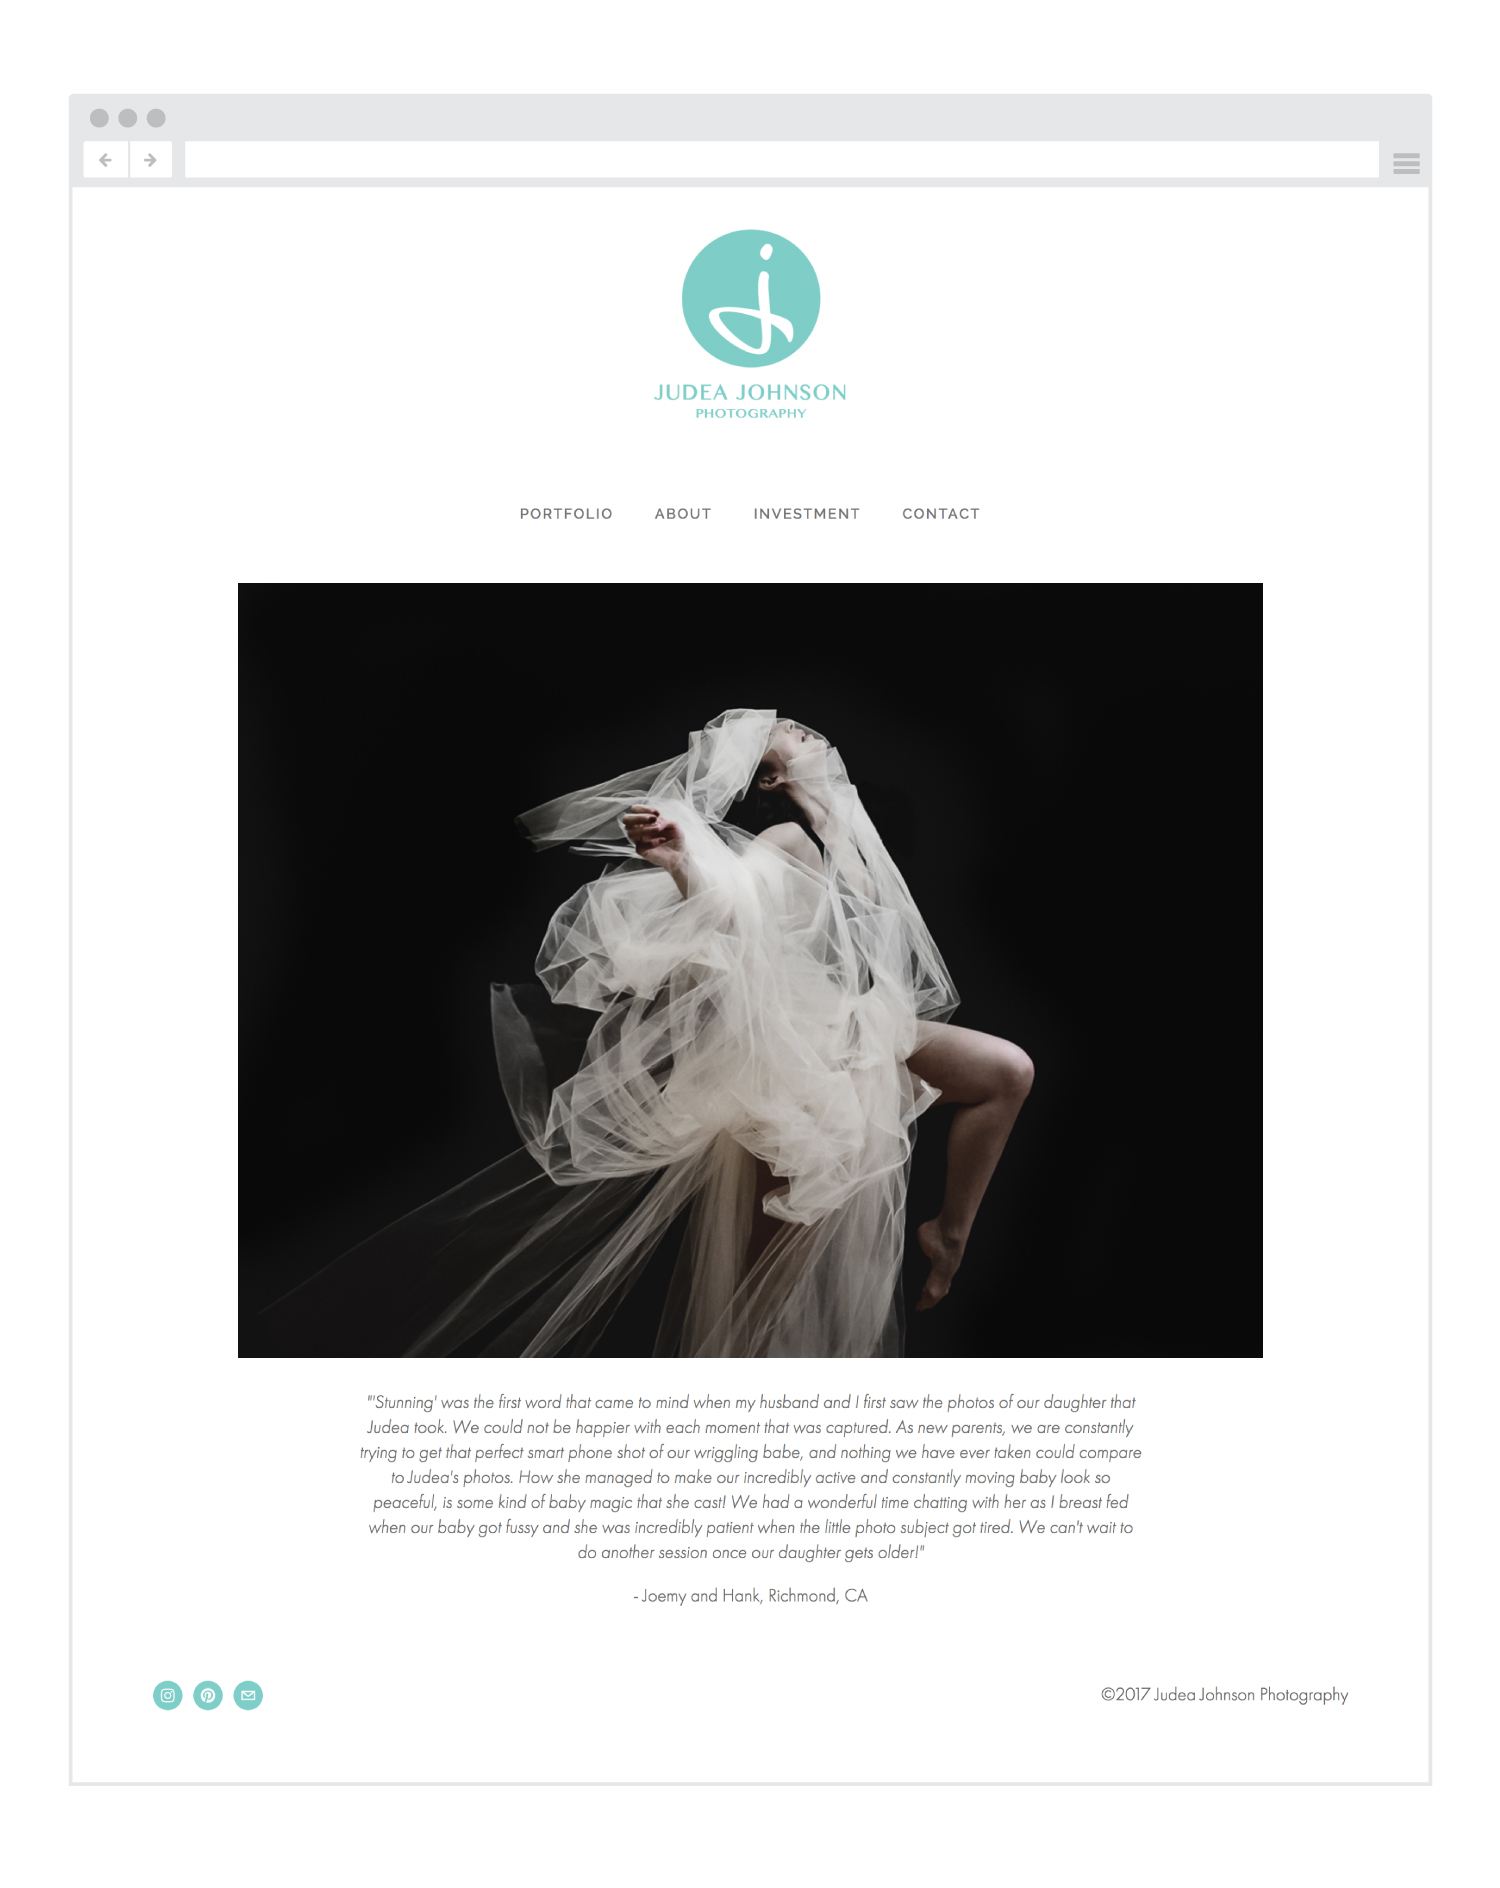 Judea-Johnson-Photography-homepage-branding-webdesign